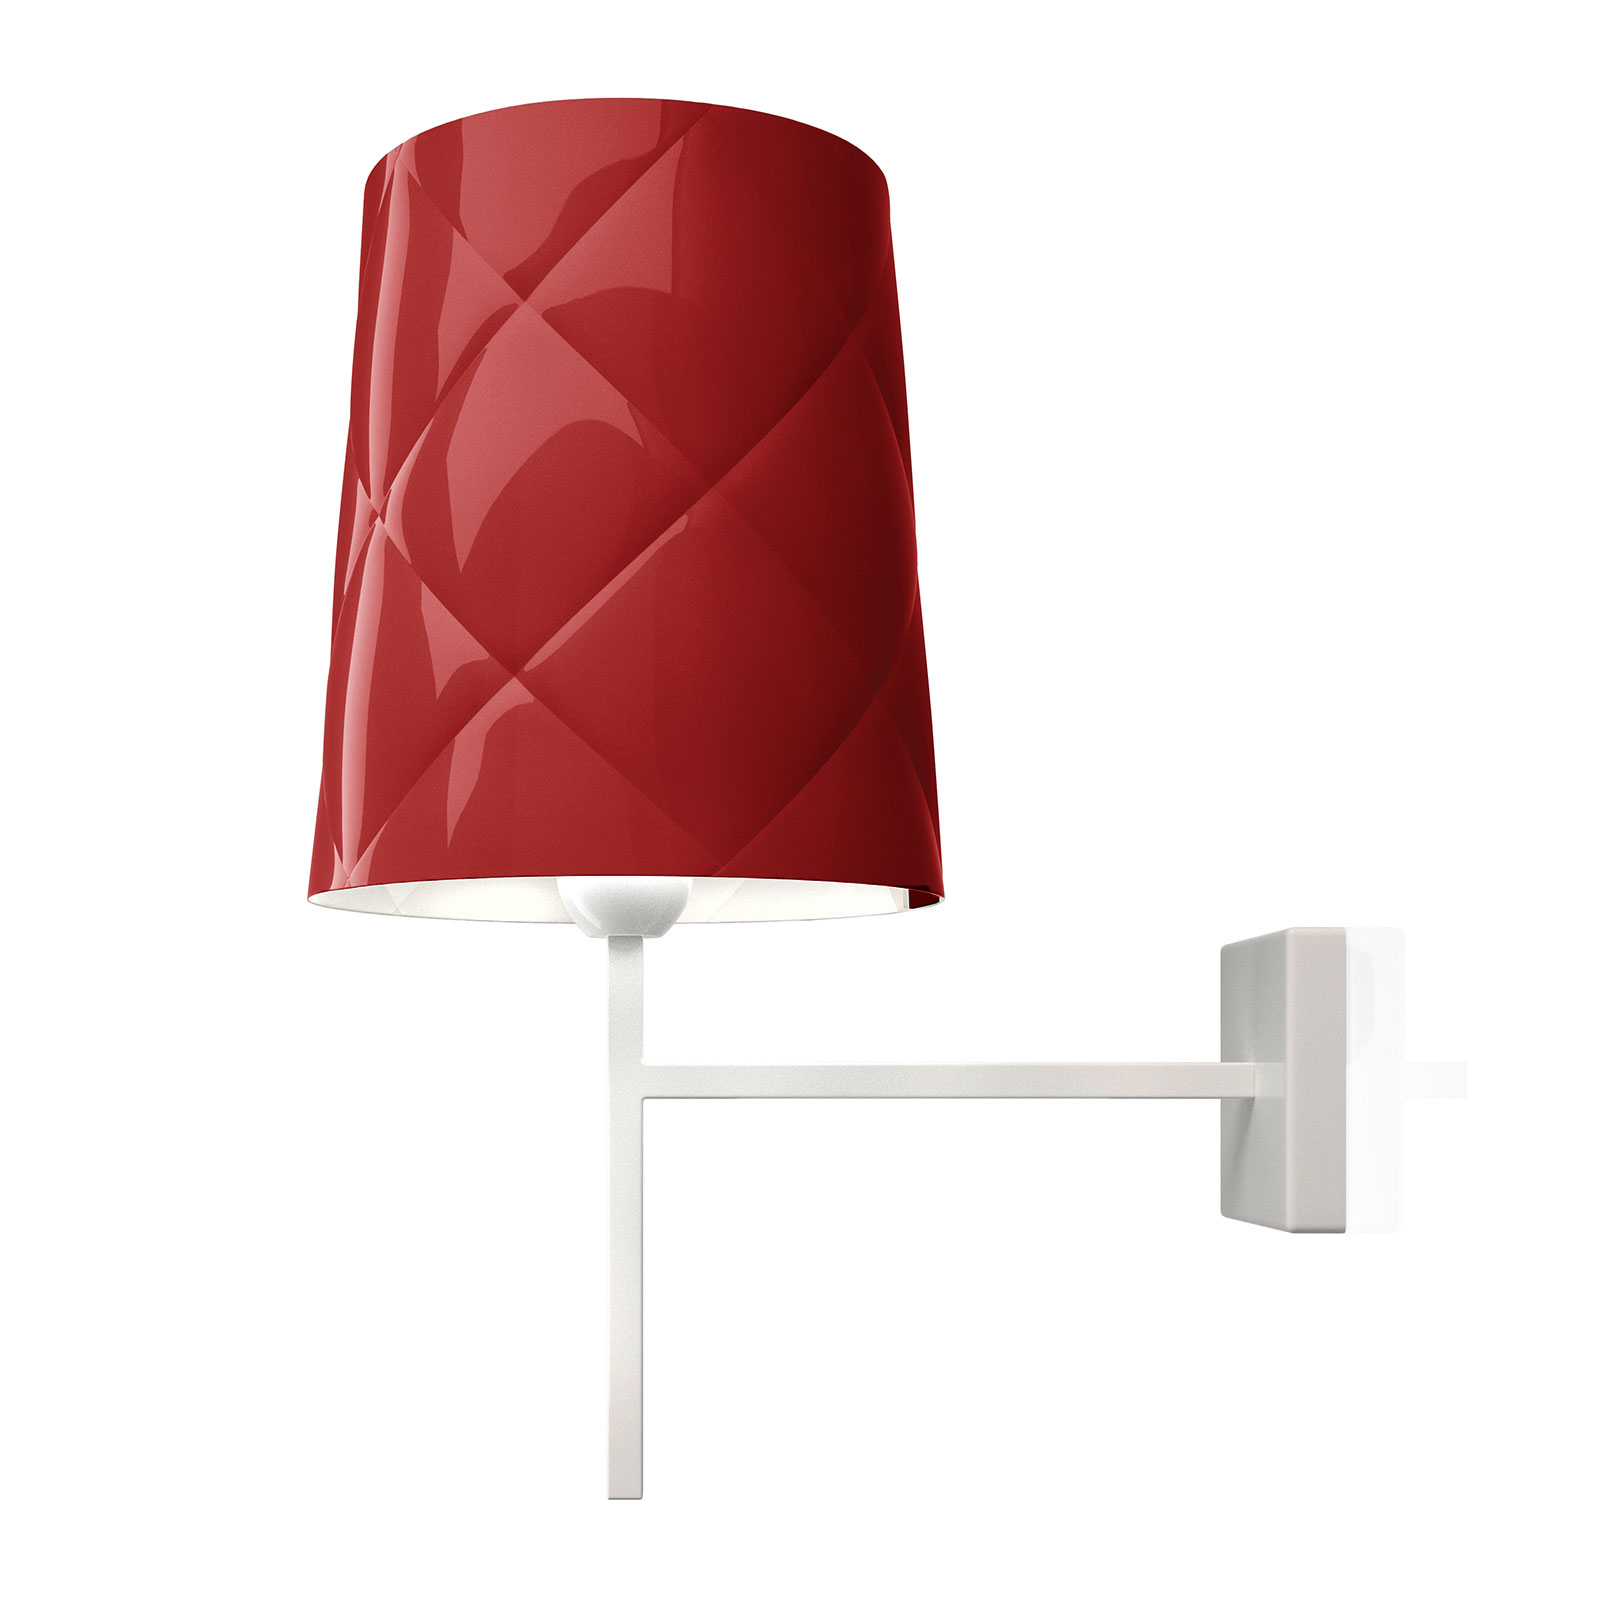 Kundalini New York wandlamp, rood